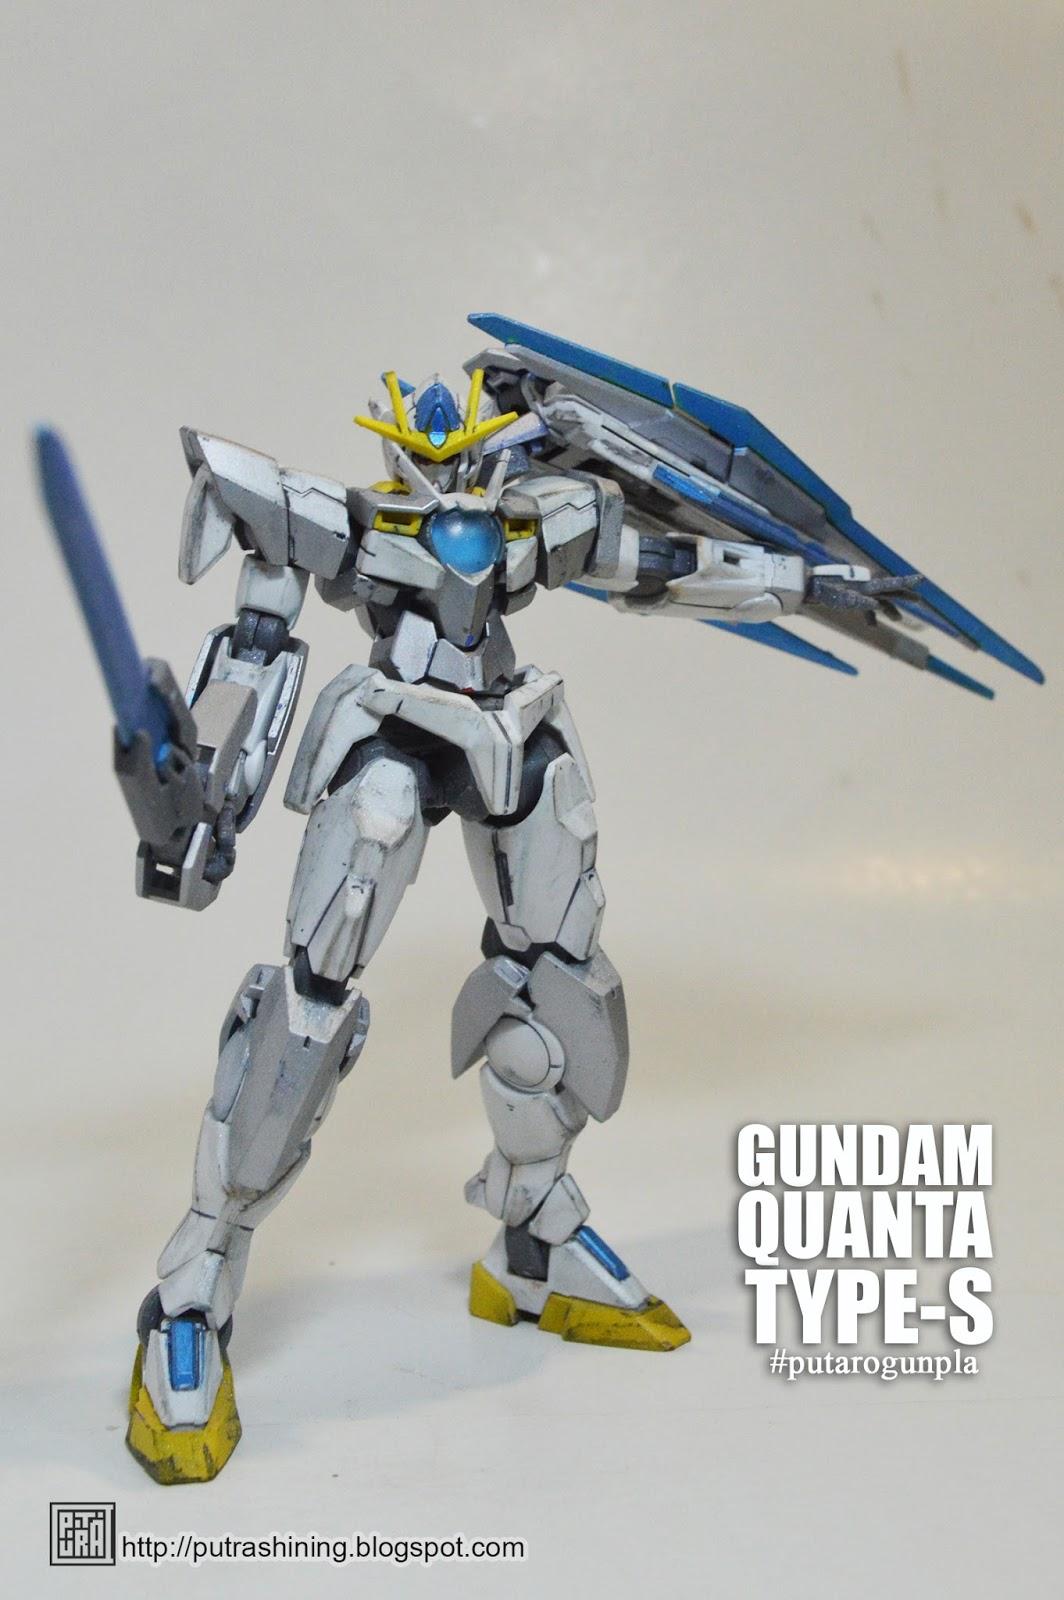 Gundam Models T Bandai Sd Bb 364 Oo Qant Qanta Quanta